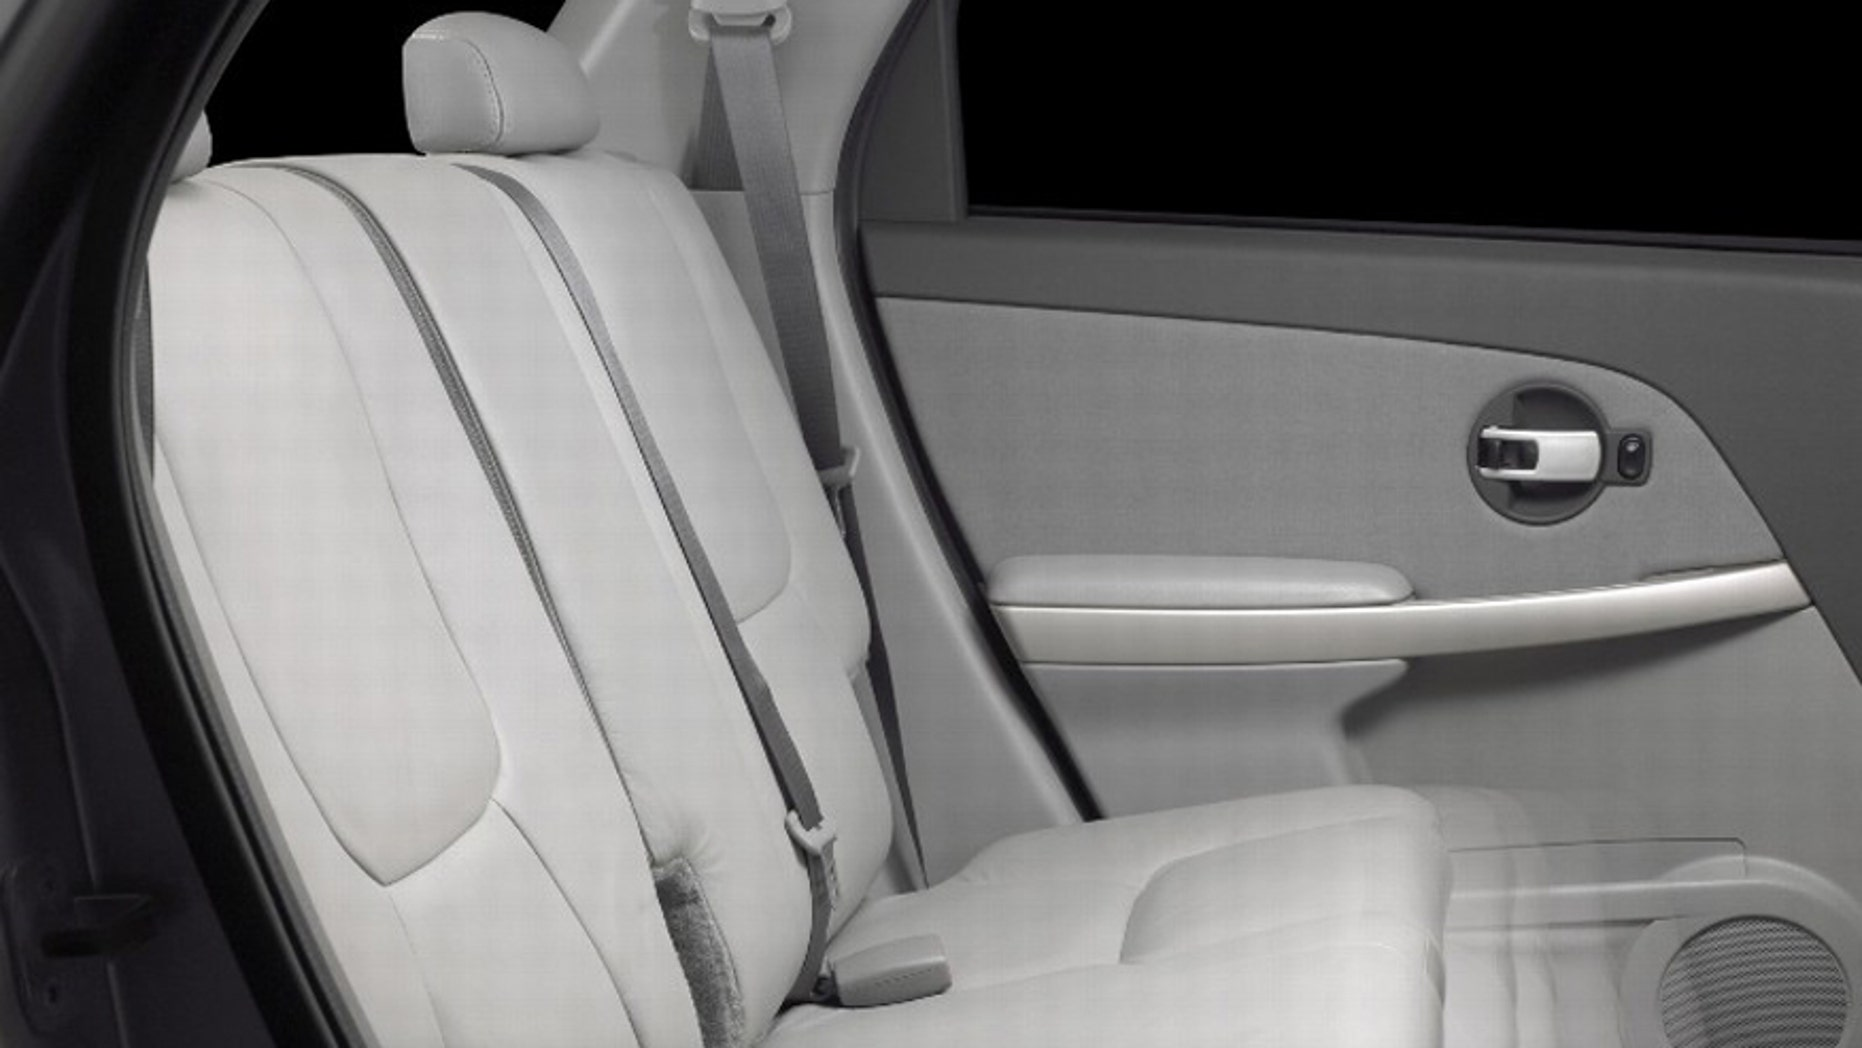 2007 Chevrolet Equnox rear seats